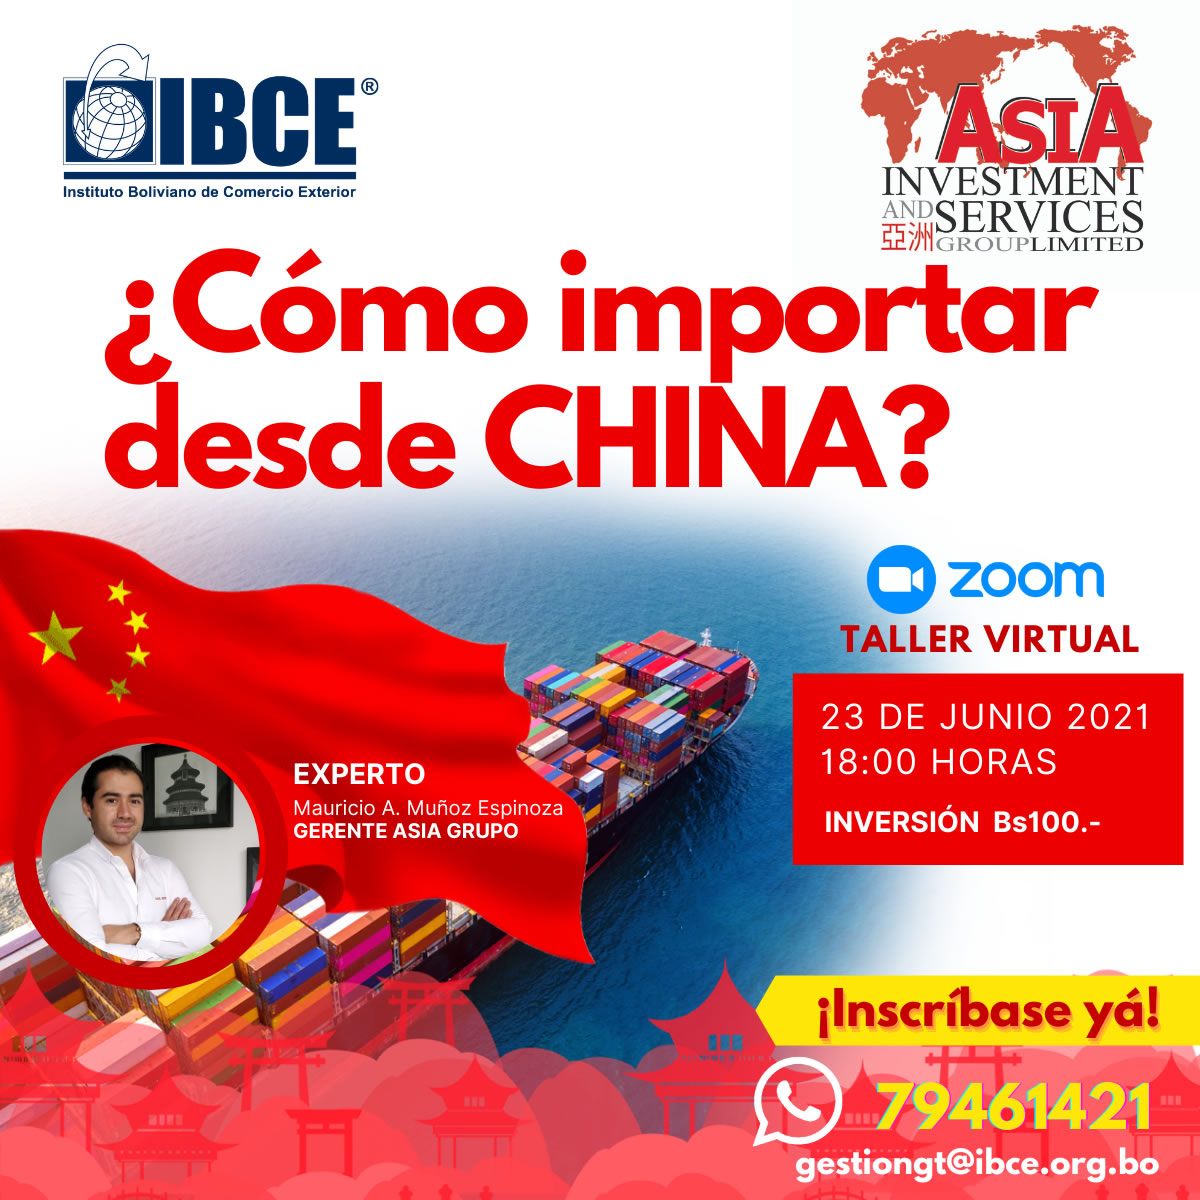 Taller Virtual: Cómo importar desde China